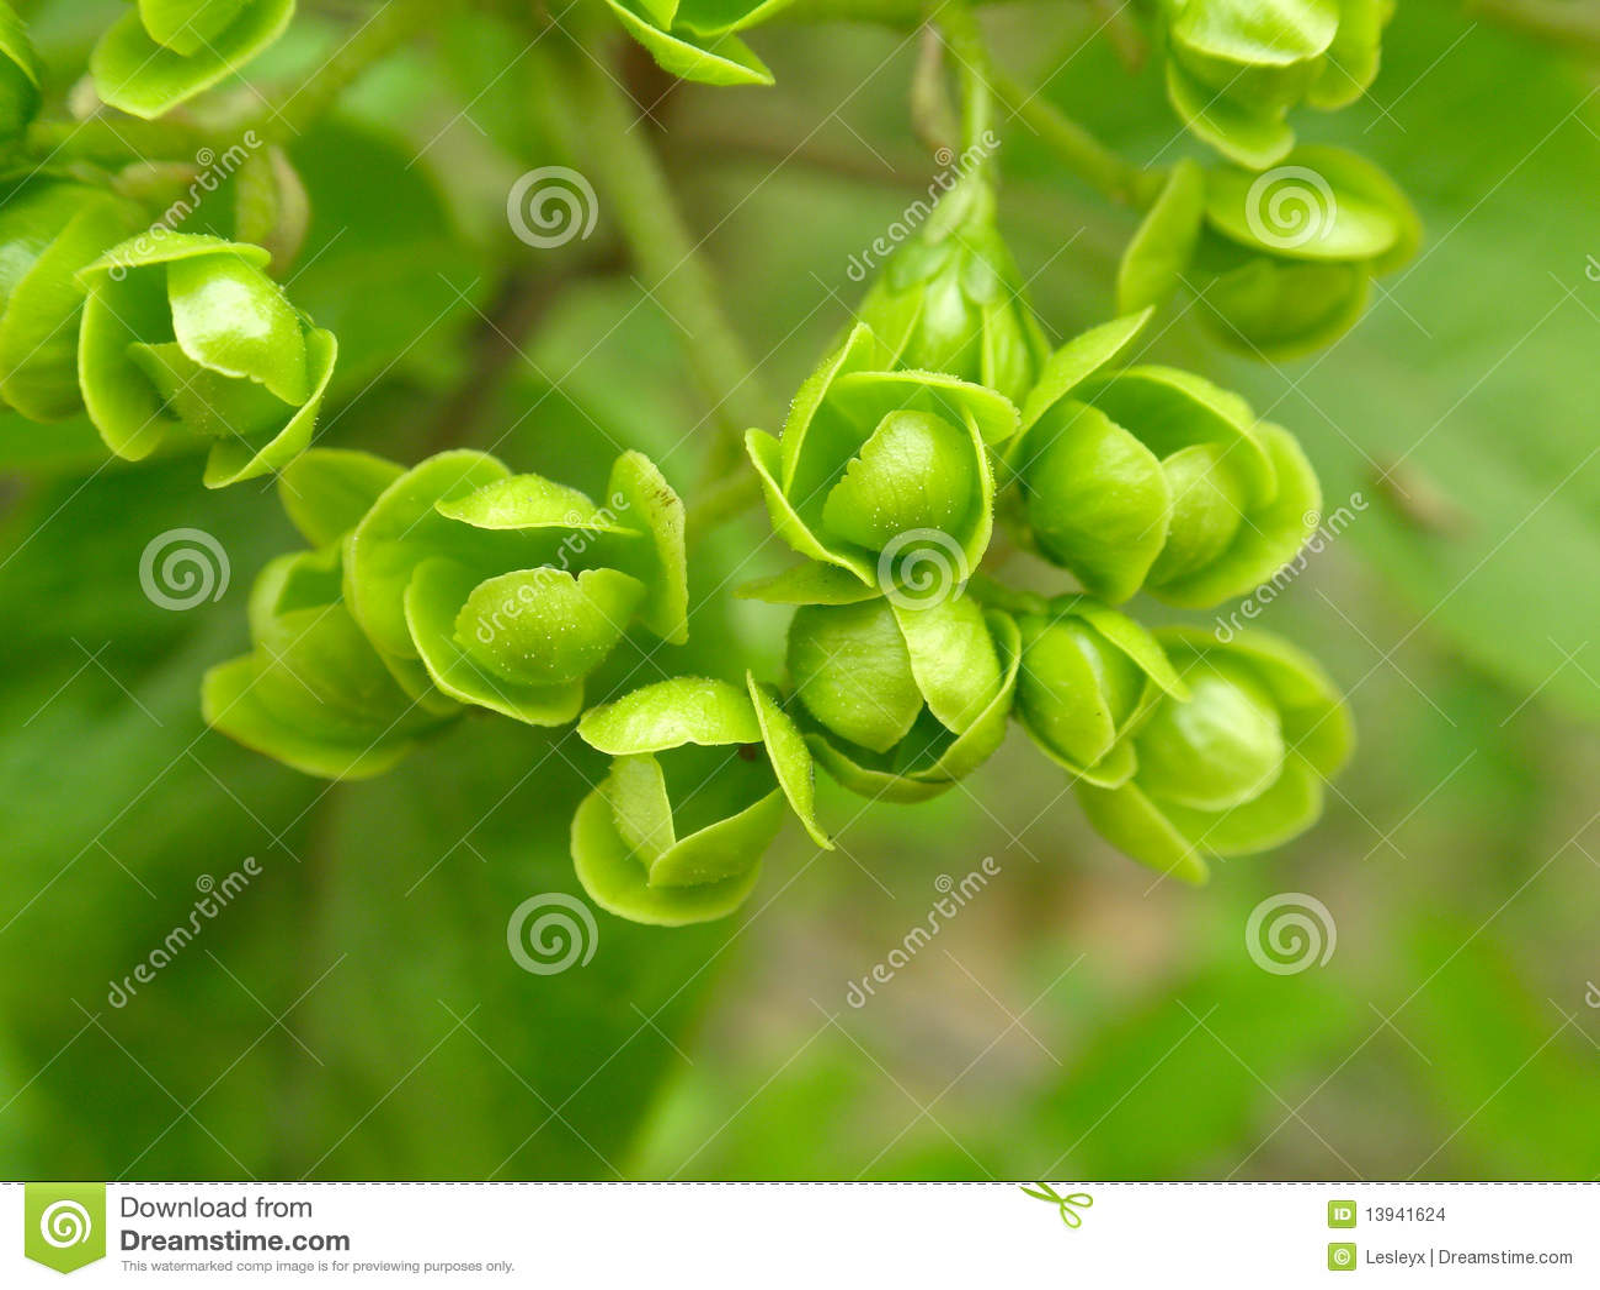 Fiori Verdi Immagini Stock - Immagine: 13941624